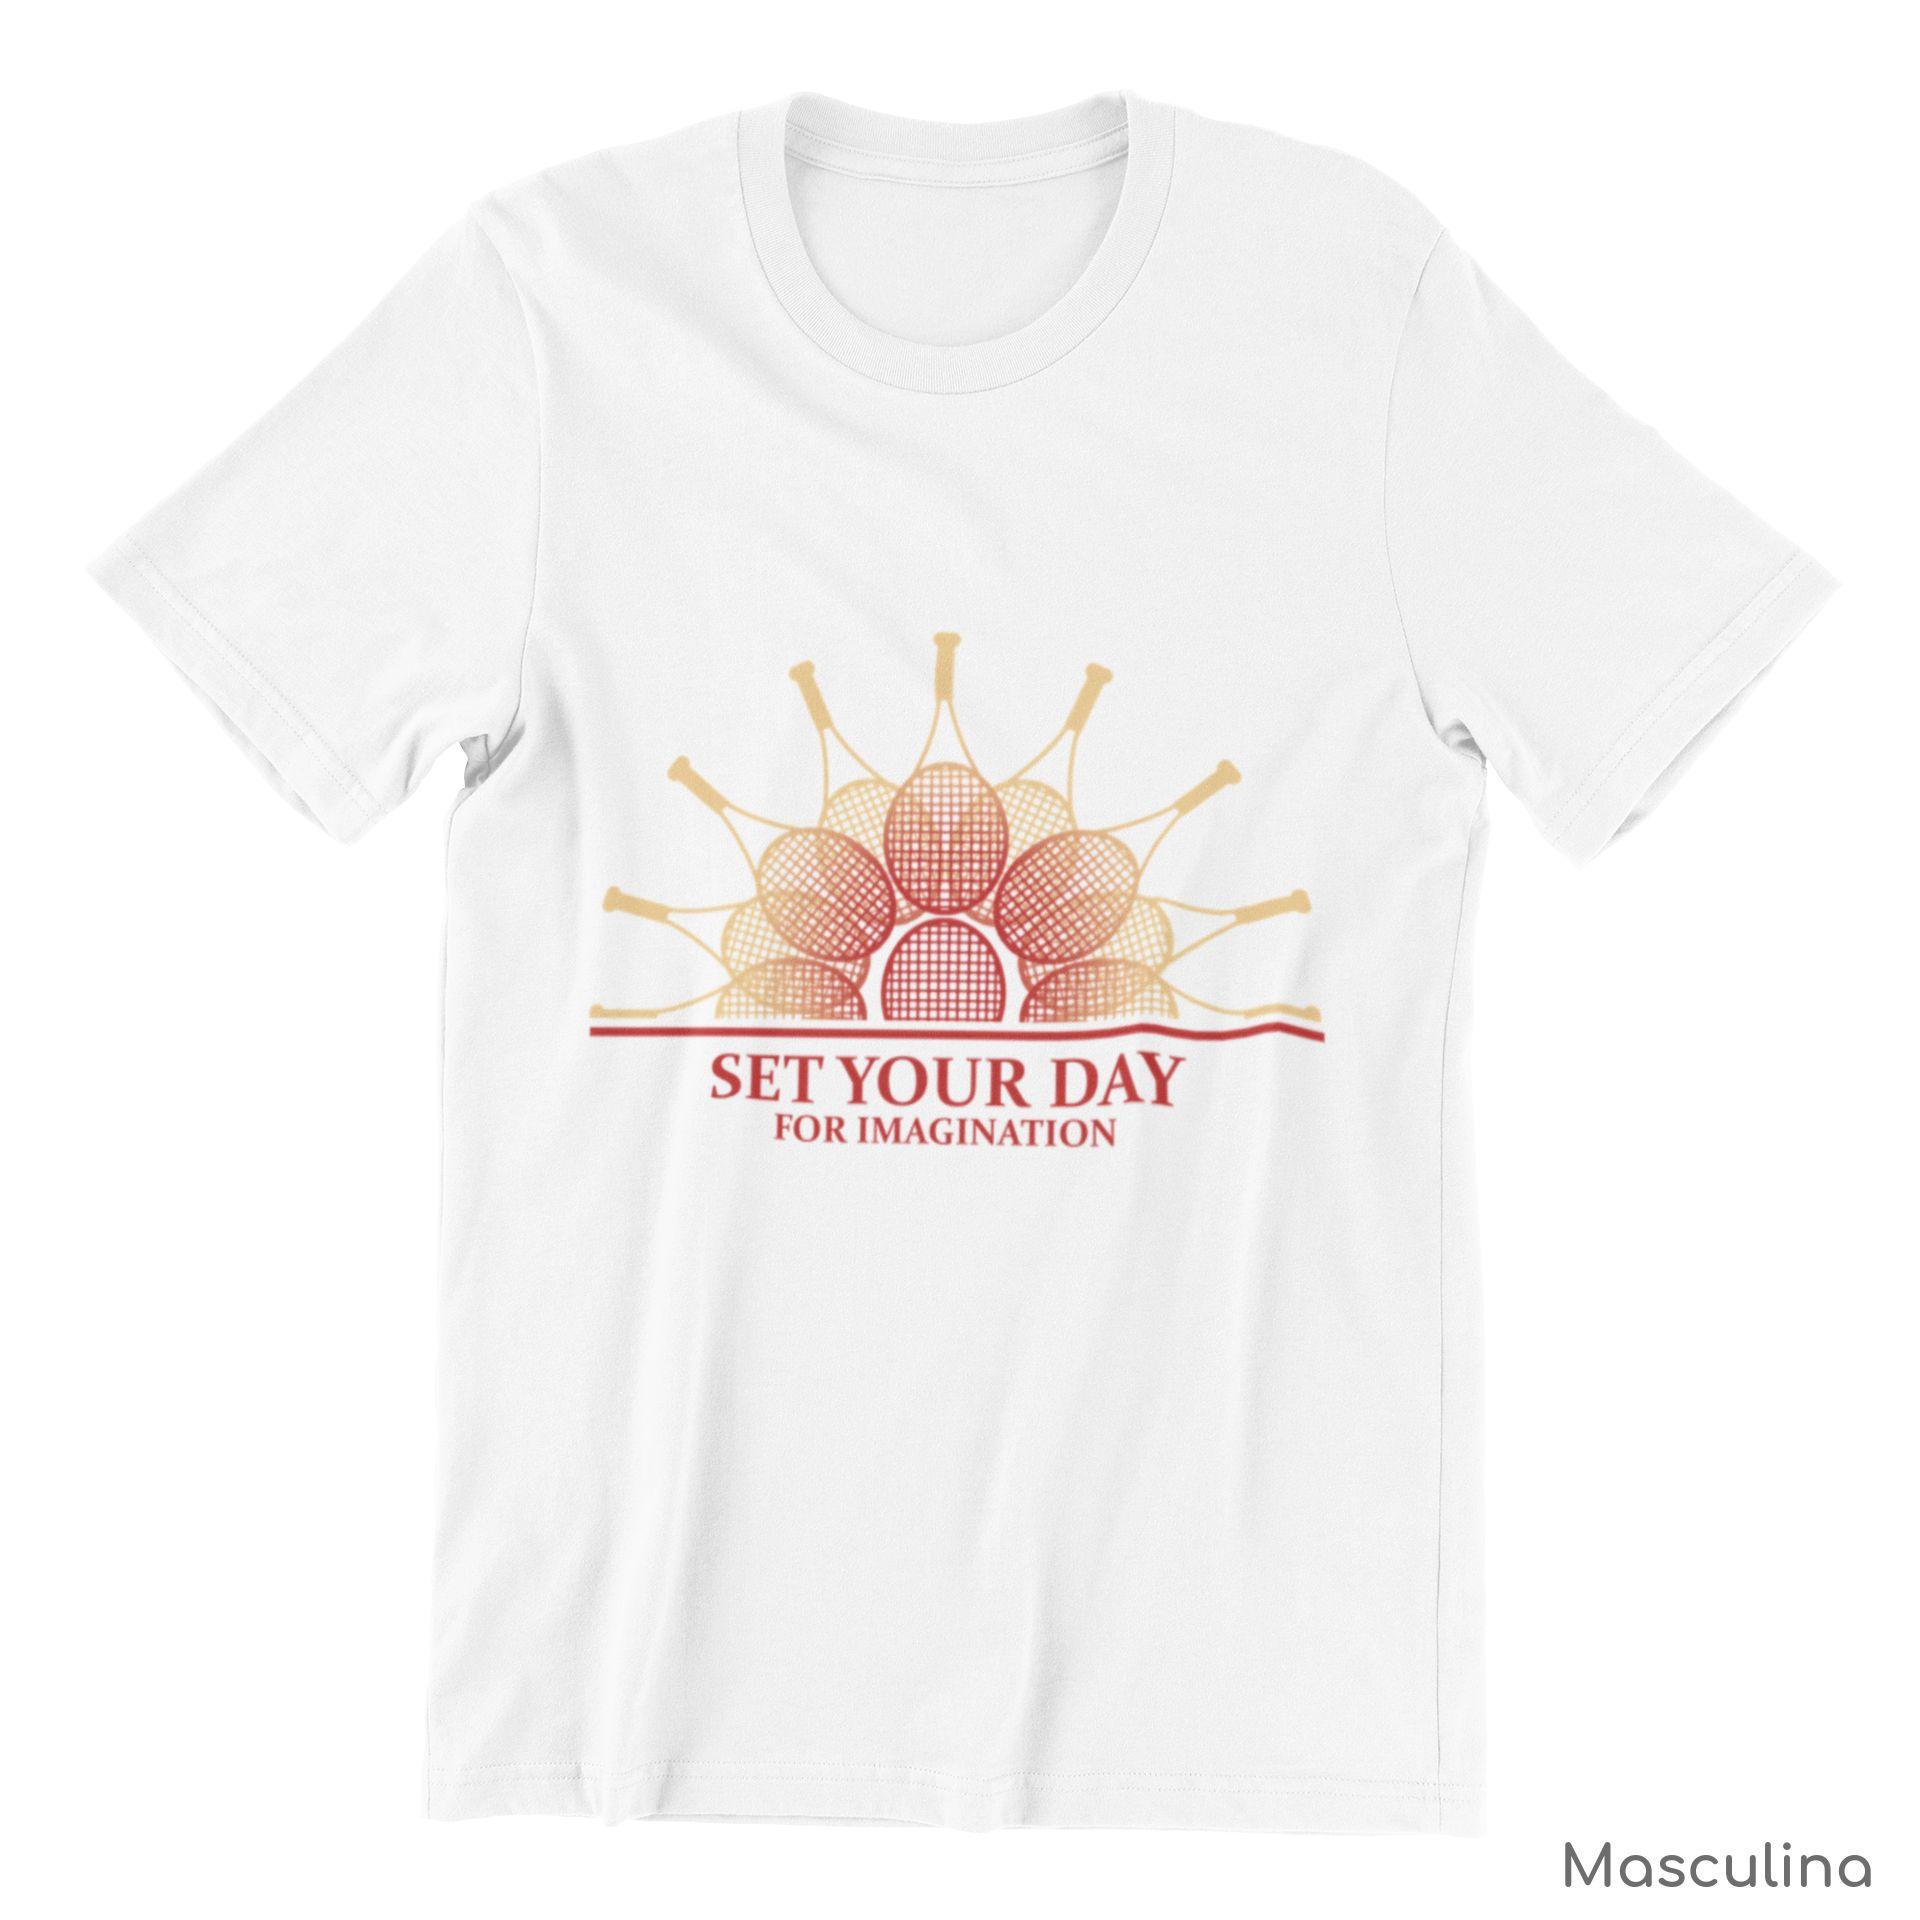 Camiseta SET YOUR DAY FOR IMAGINATION  >> MASCULINA